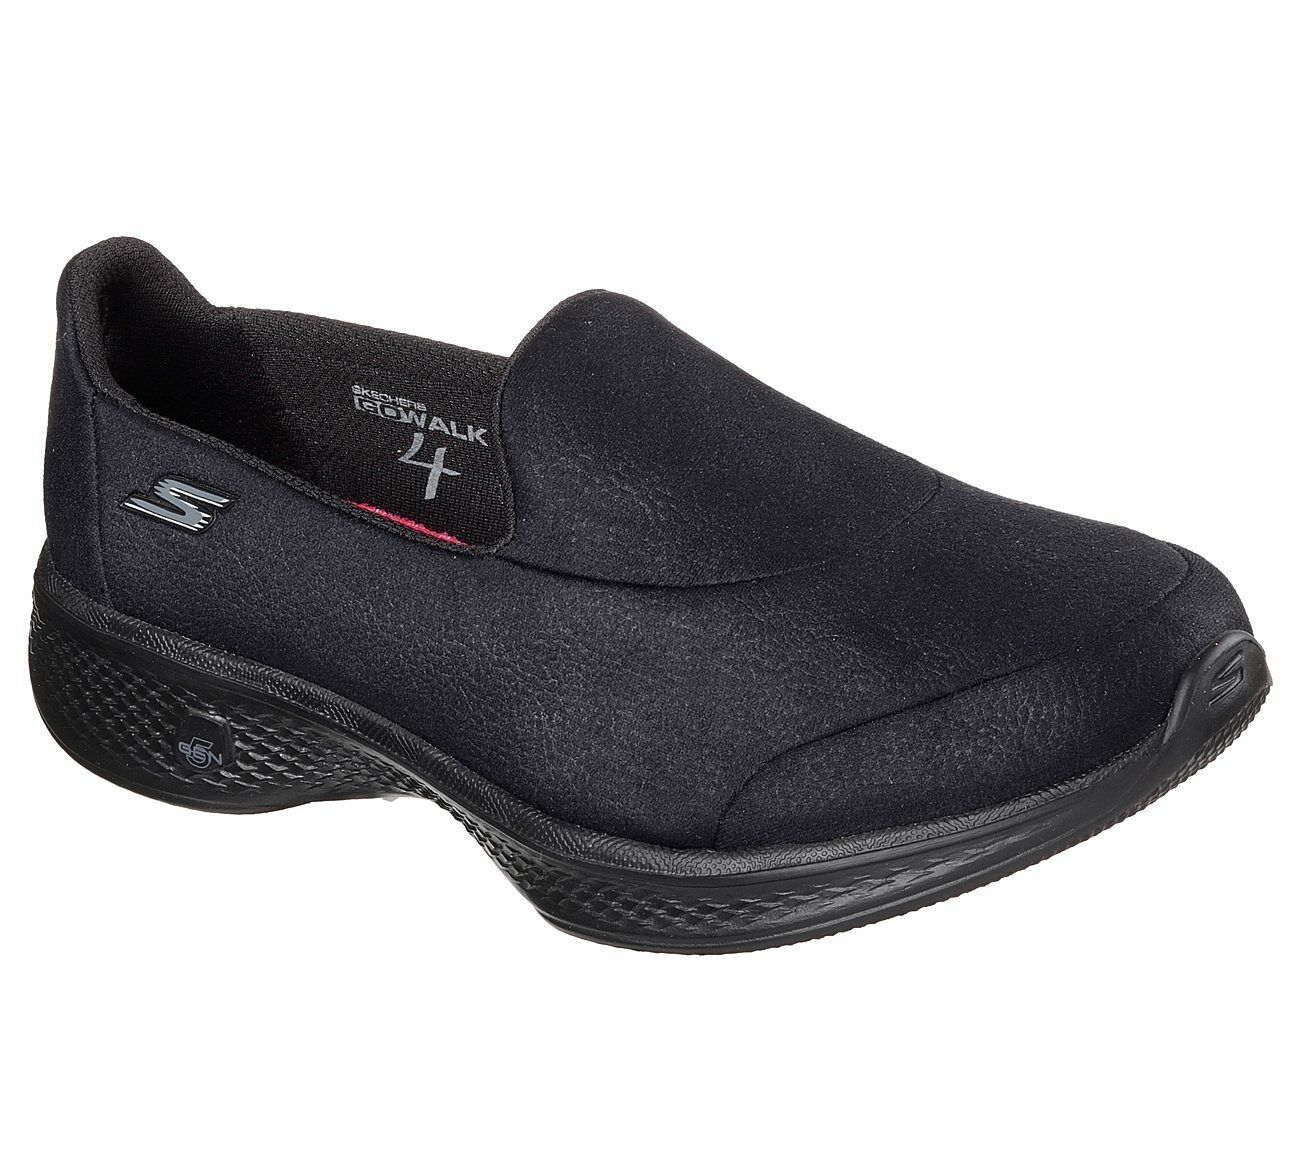 femmes  Skechers Go Walk Trainer Casual  noir  Lightweight Memory foam Summer Shoe